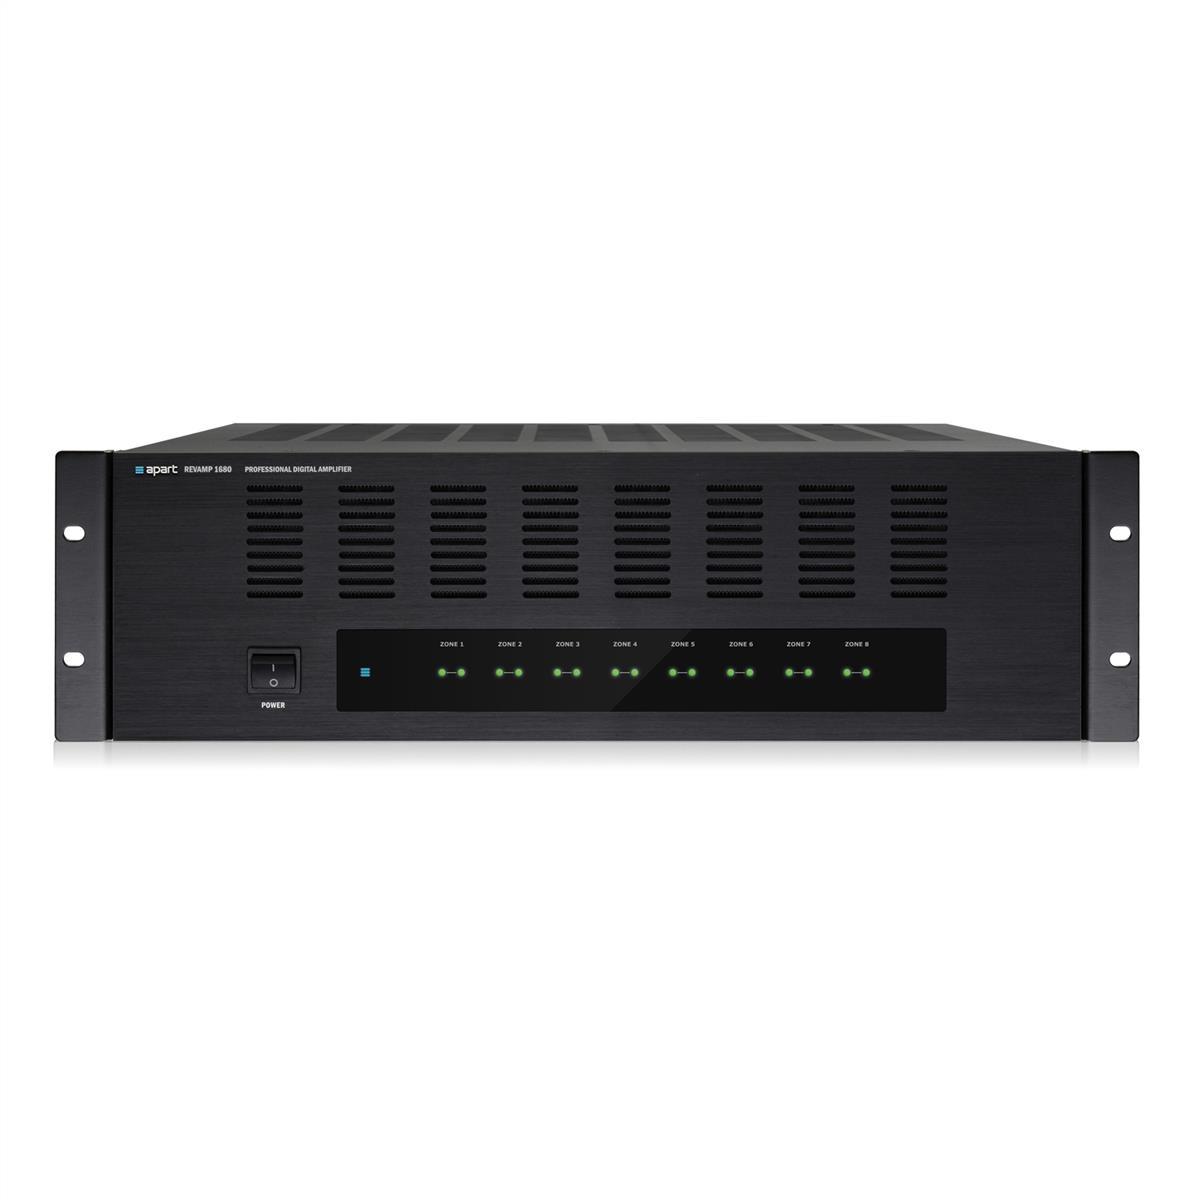 Apart 16 channel digital power amlifire 16x80W/4ohm rms